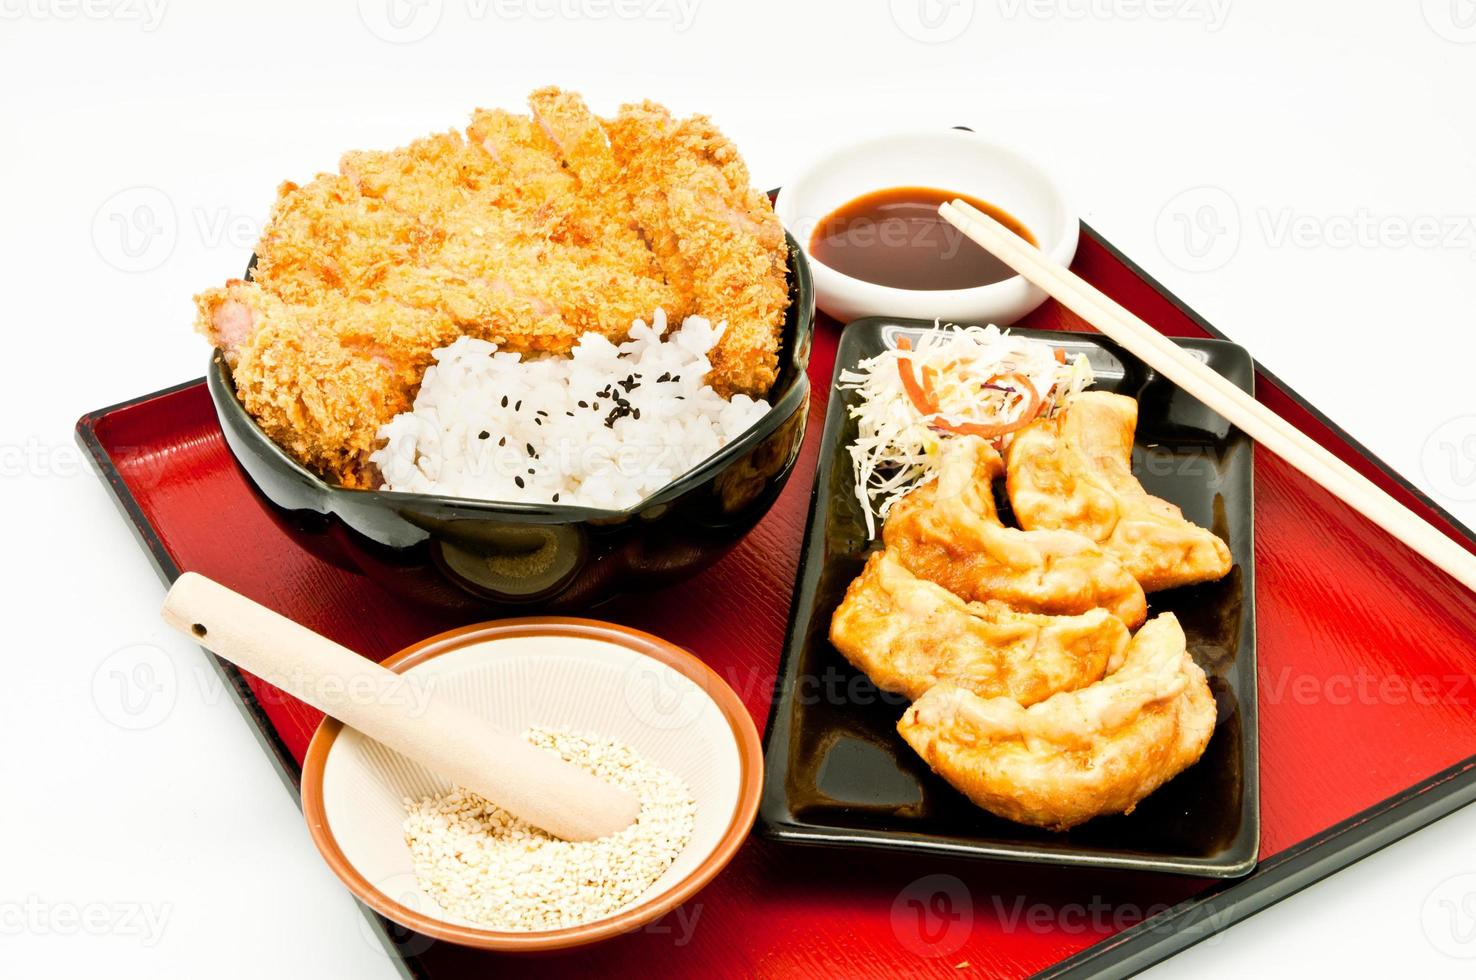 rijst en gebakken varkenskotelet en gebakken knoedels foto